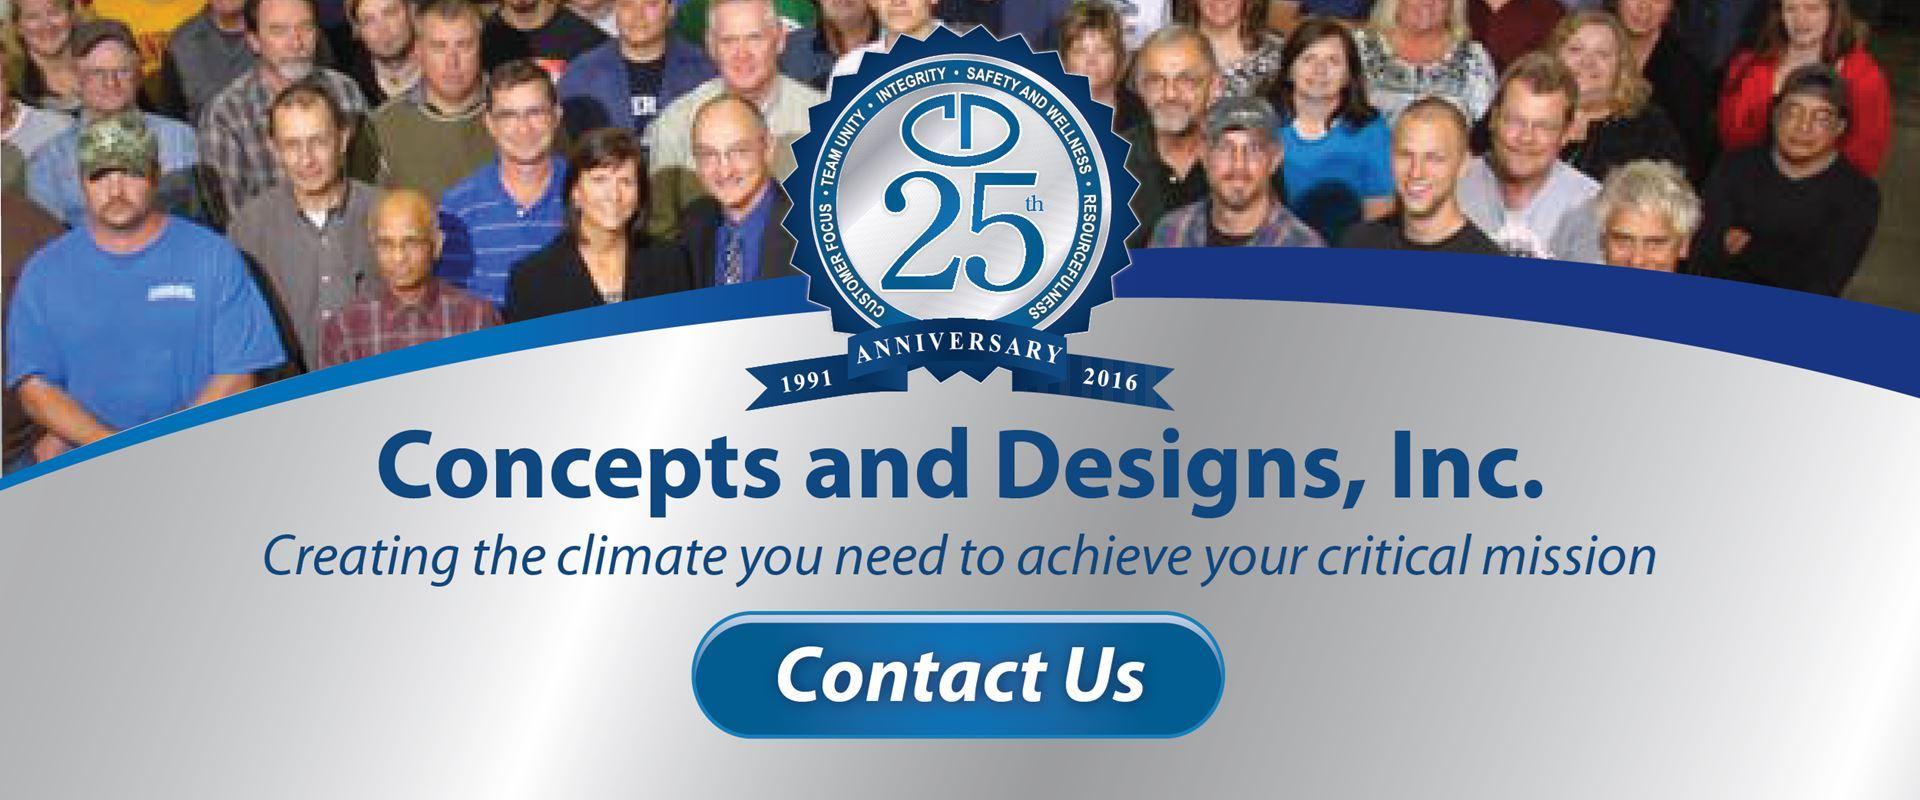 Concepts and Designs, Inc. 25th Anniverary